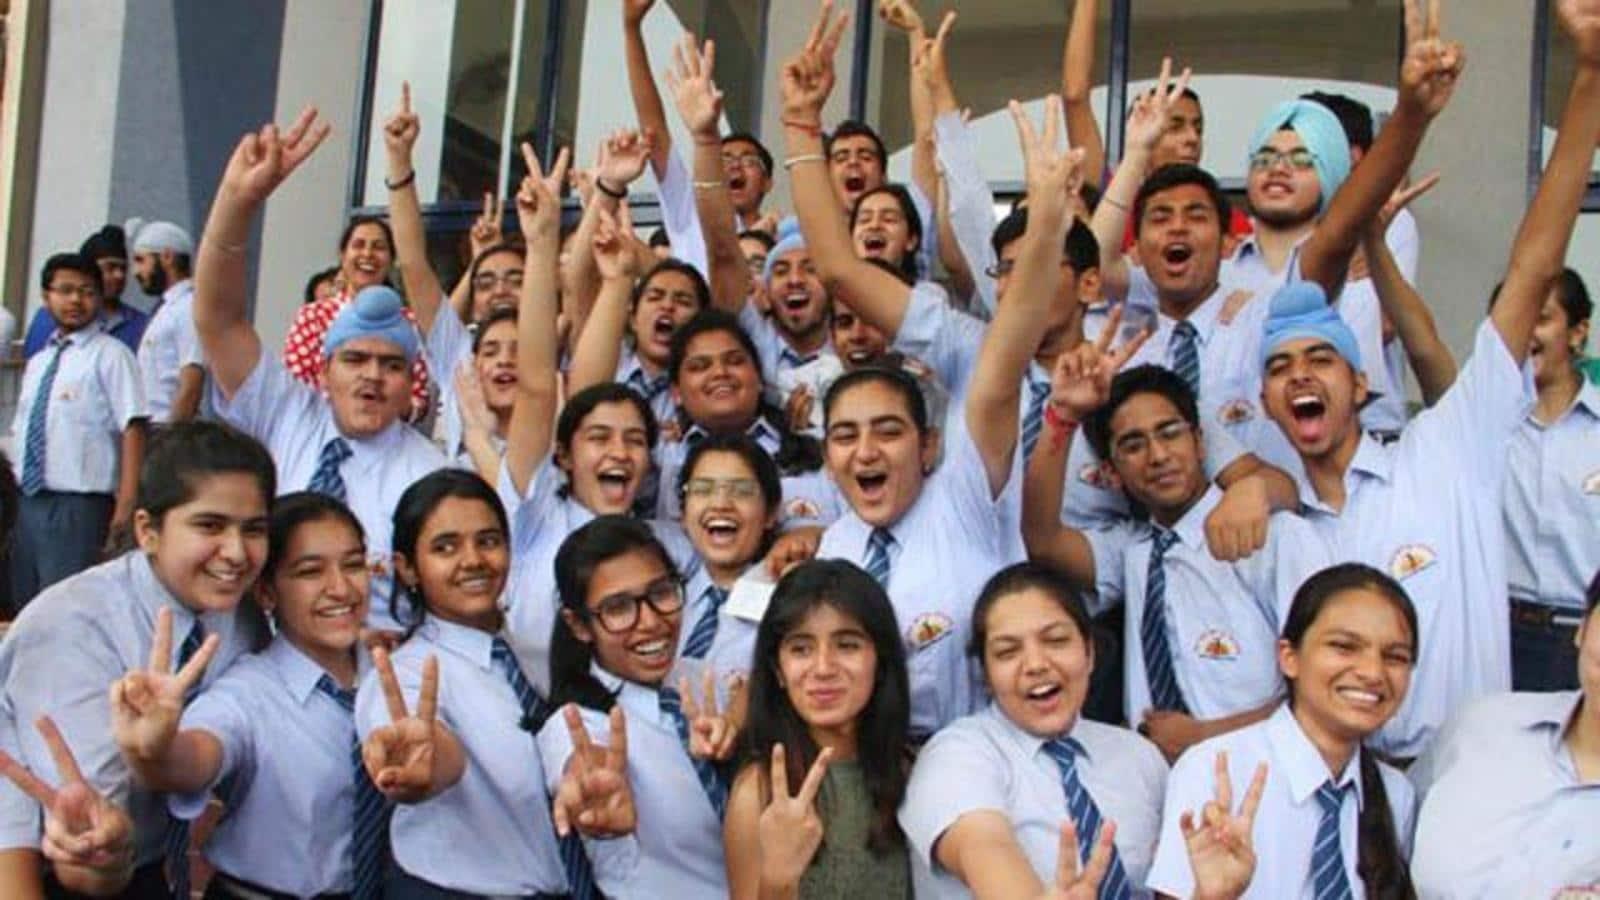 Punjab tops performance grading index in school education | பள்ளி கல்வியில் செயல்திறன் தர நிர்ணய குறியீட்டில் பஞ்சாப் முதலிடம் வகிக்கிறது |_40.1